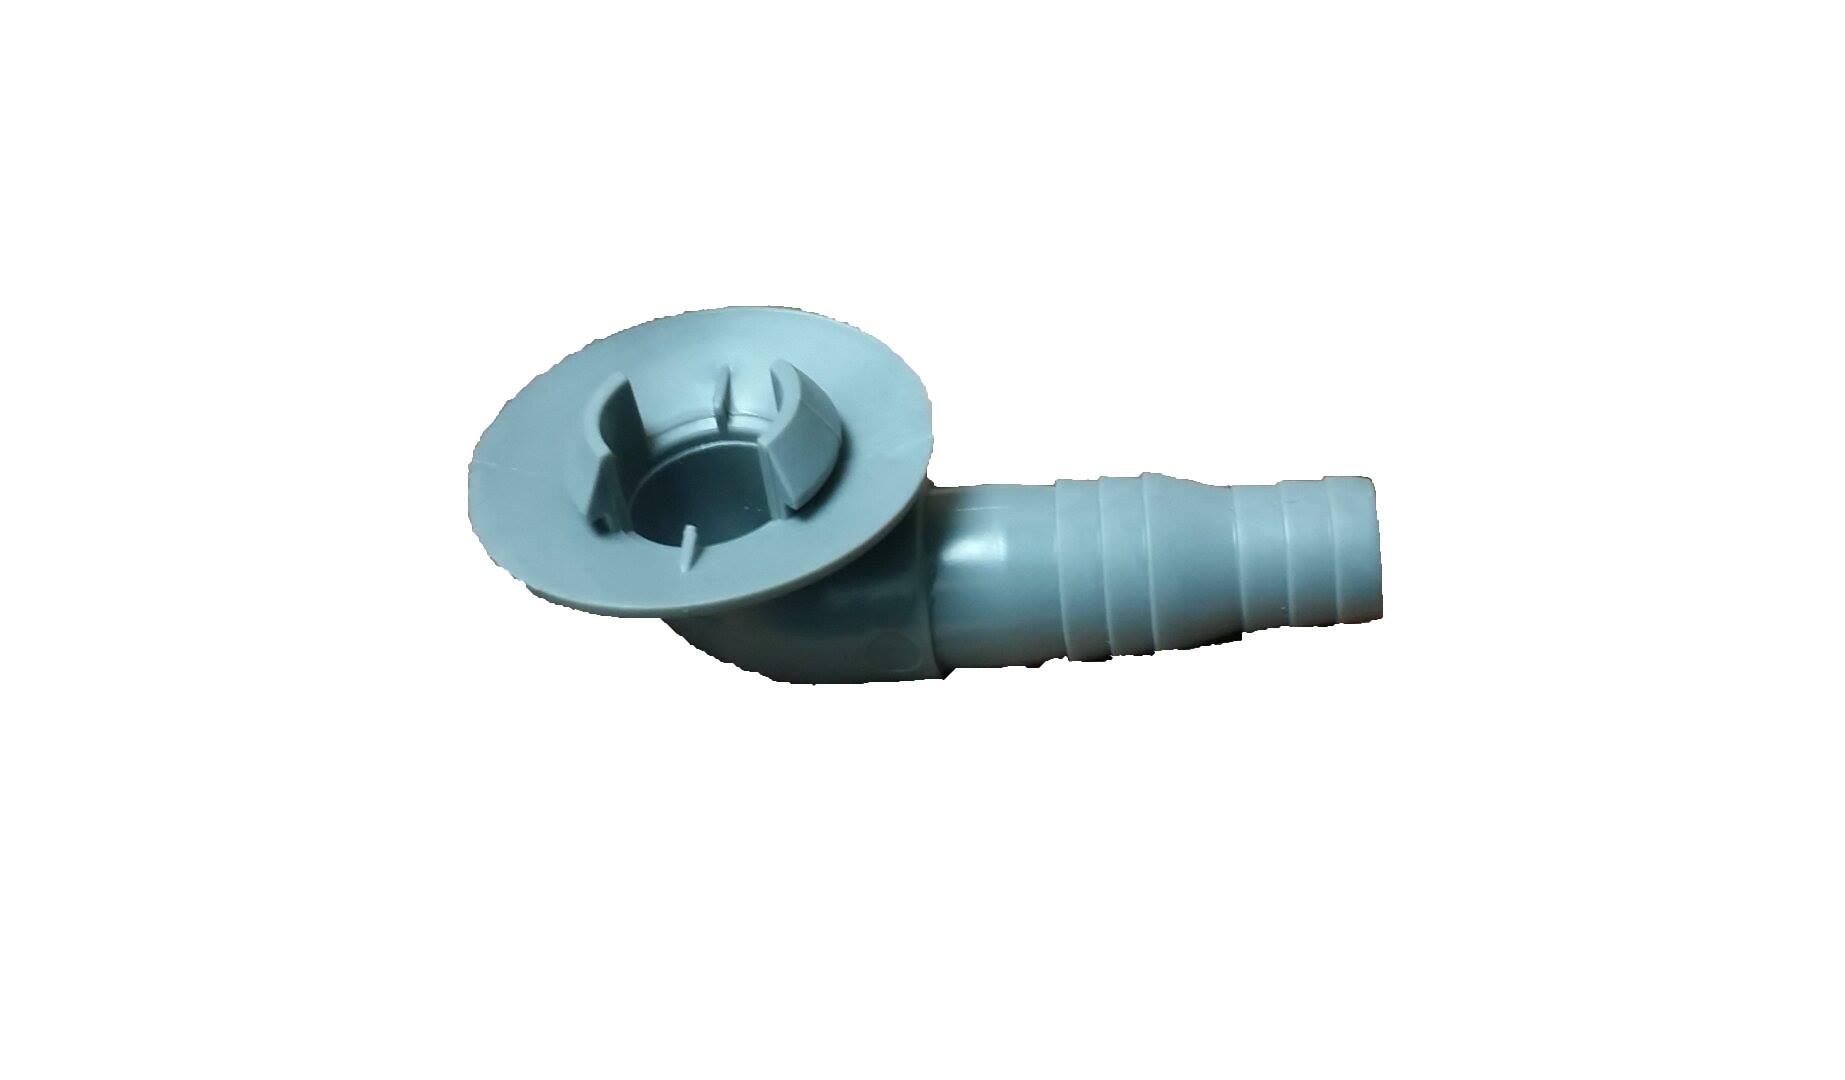 L Drain Adapter For Compressor